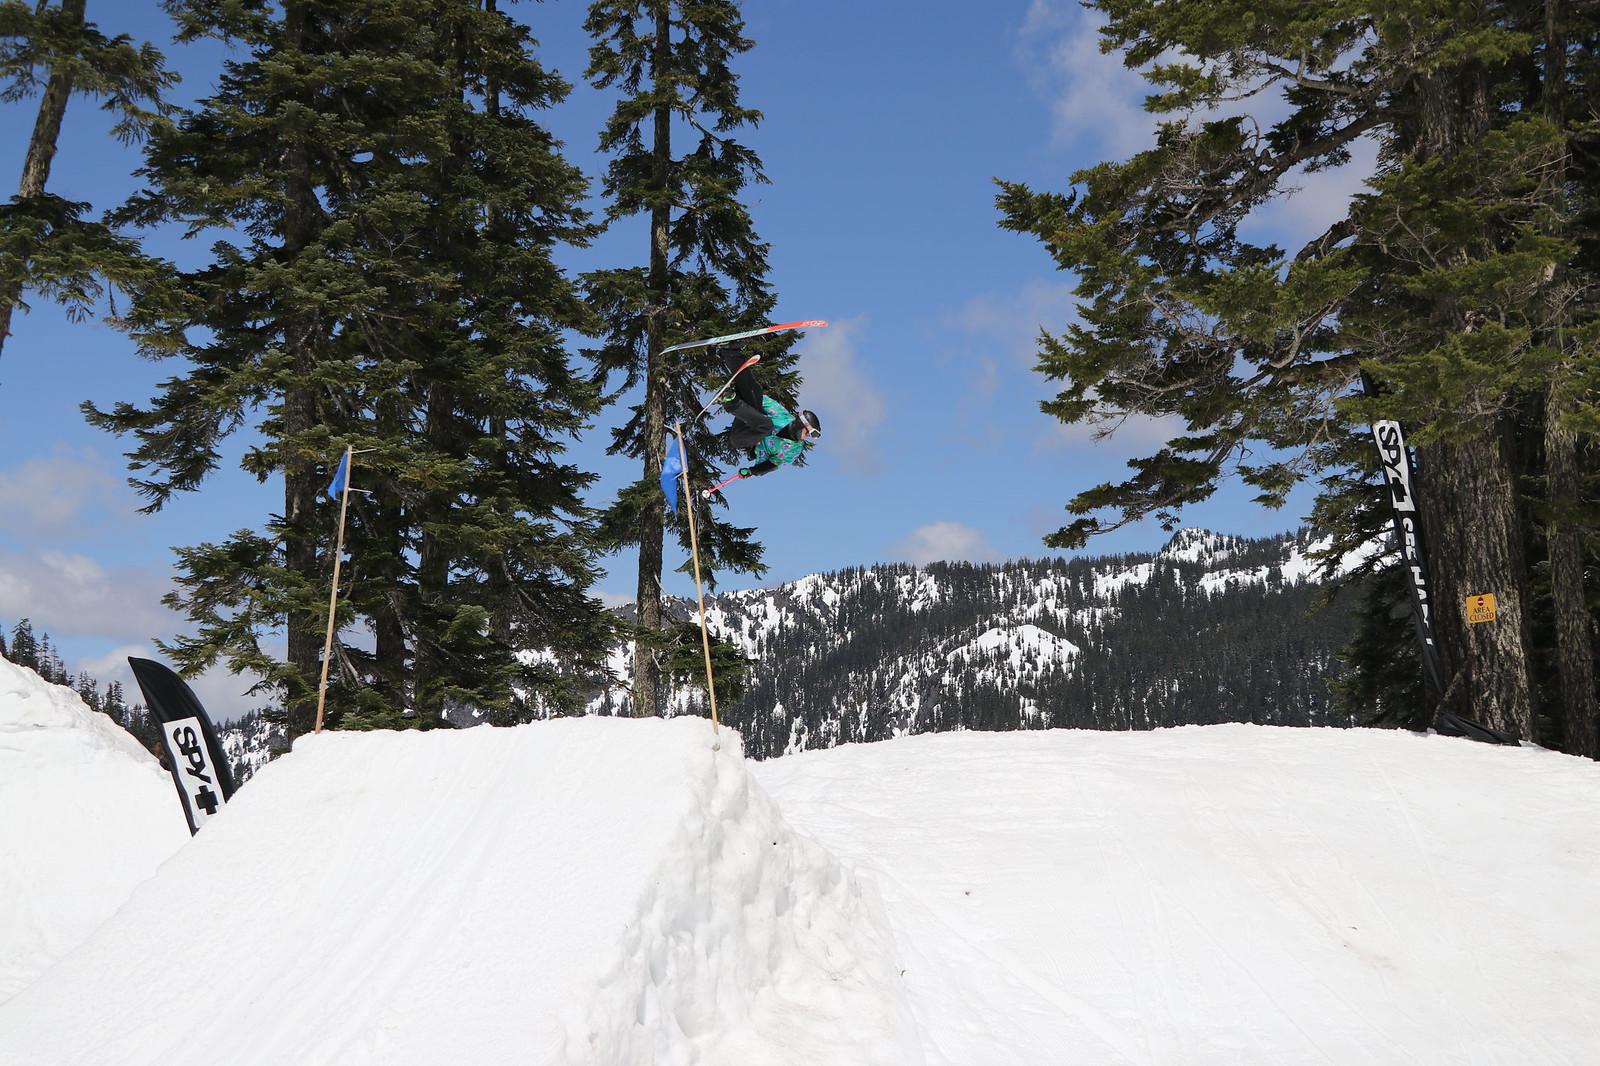 Skier flatspin